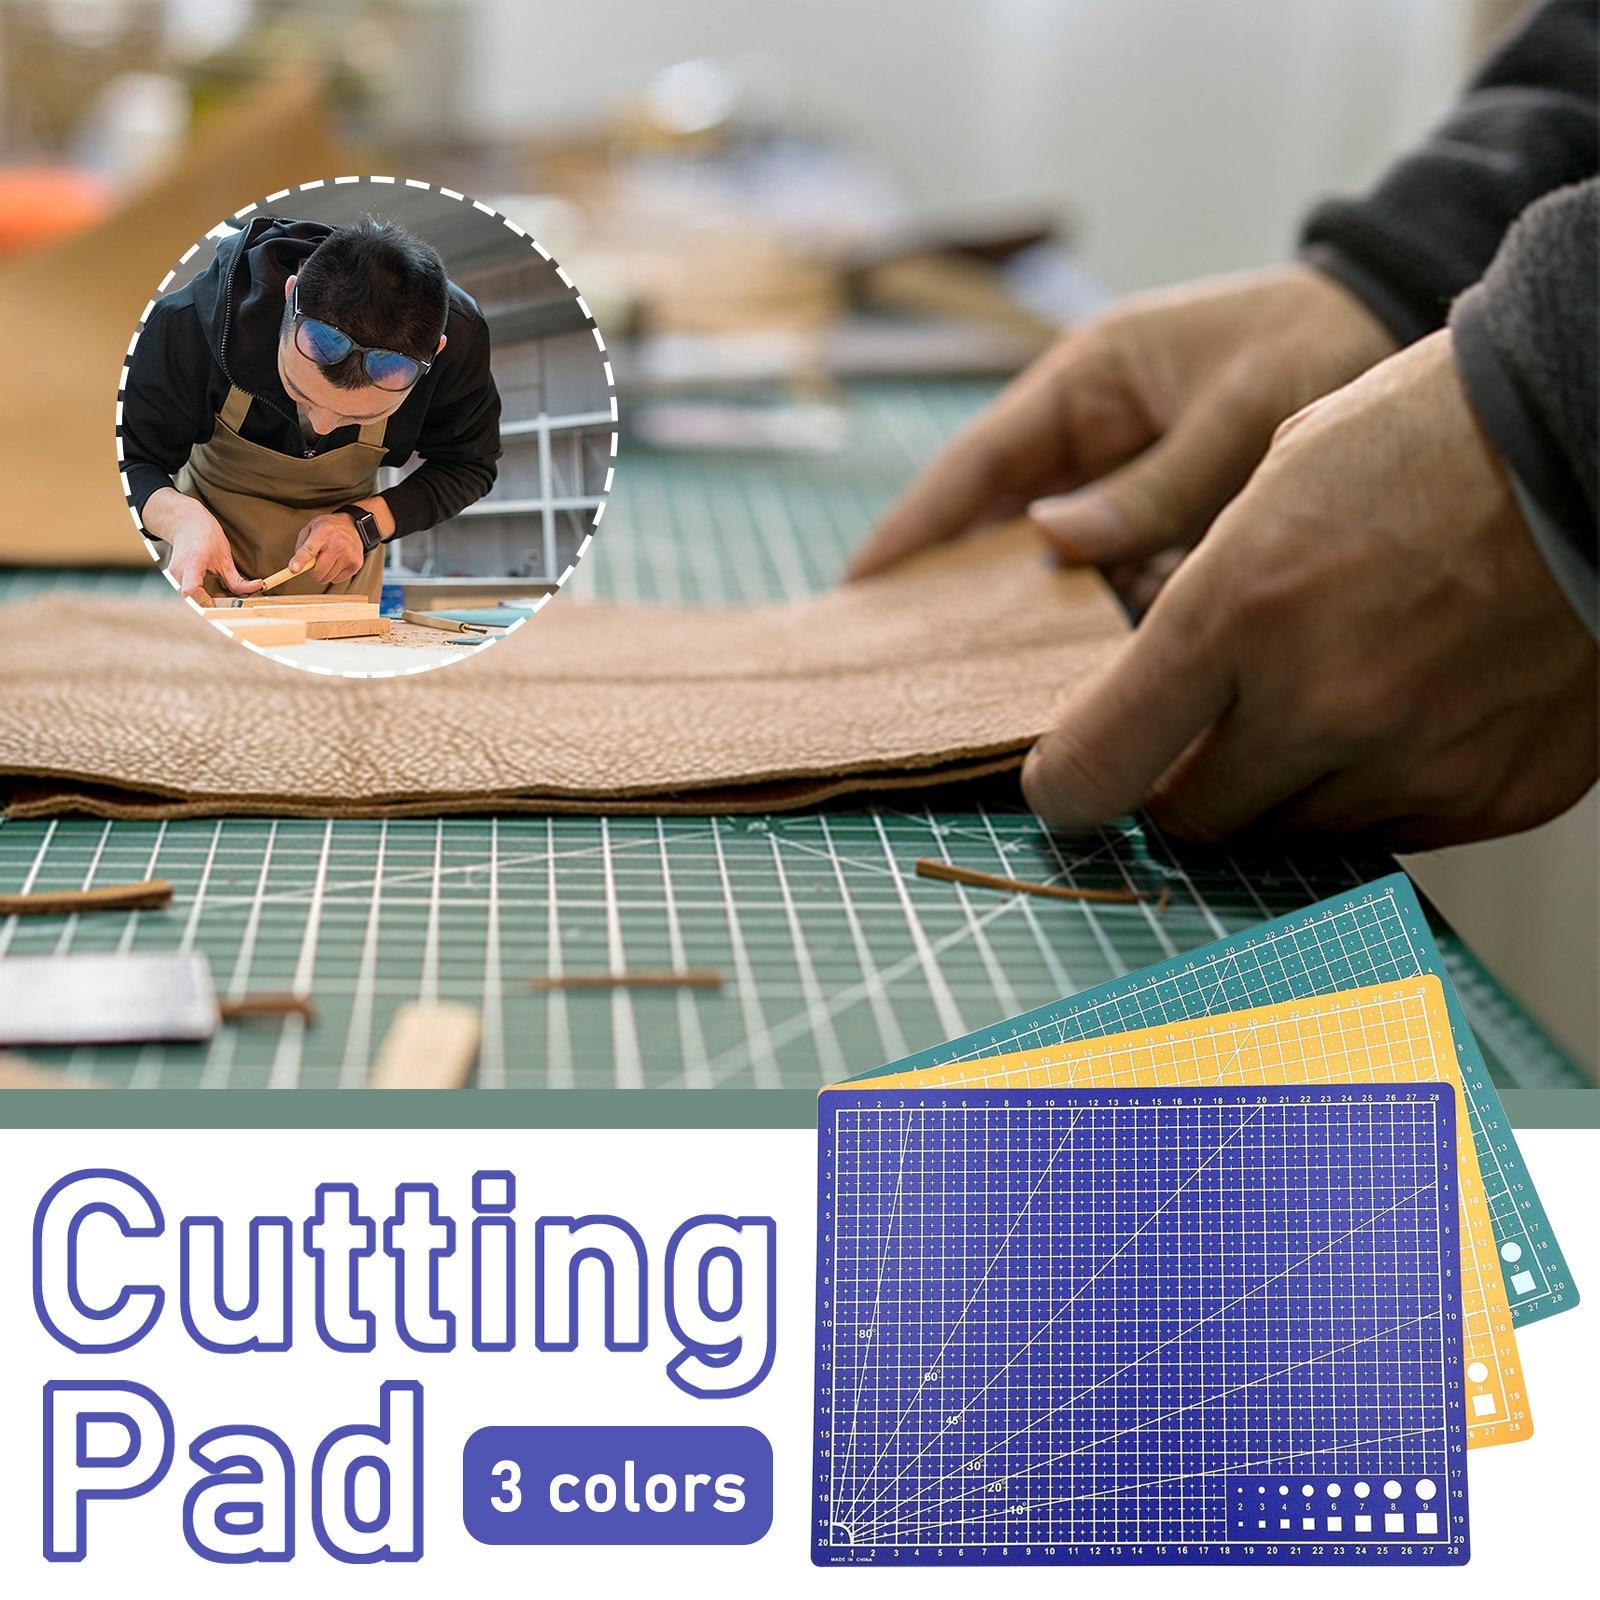 ПВХ коврик для резки A3/A4/A5, прочный коврик для резки в стиле пэчворк, инструменты для пэчворка, самовосстанавливающаяся пластина для резки, Н...